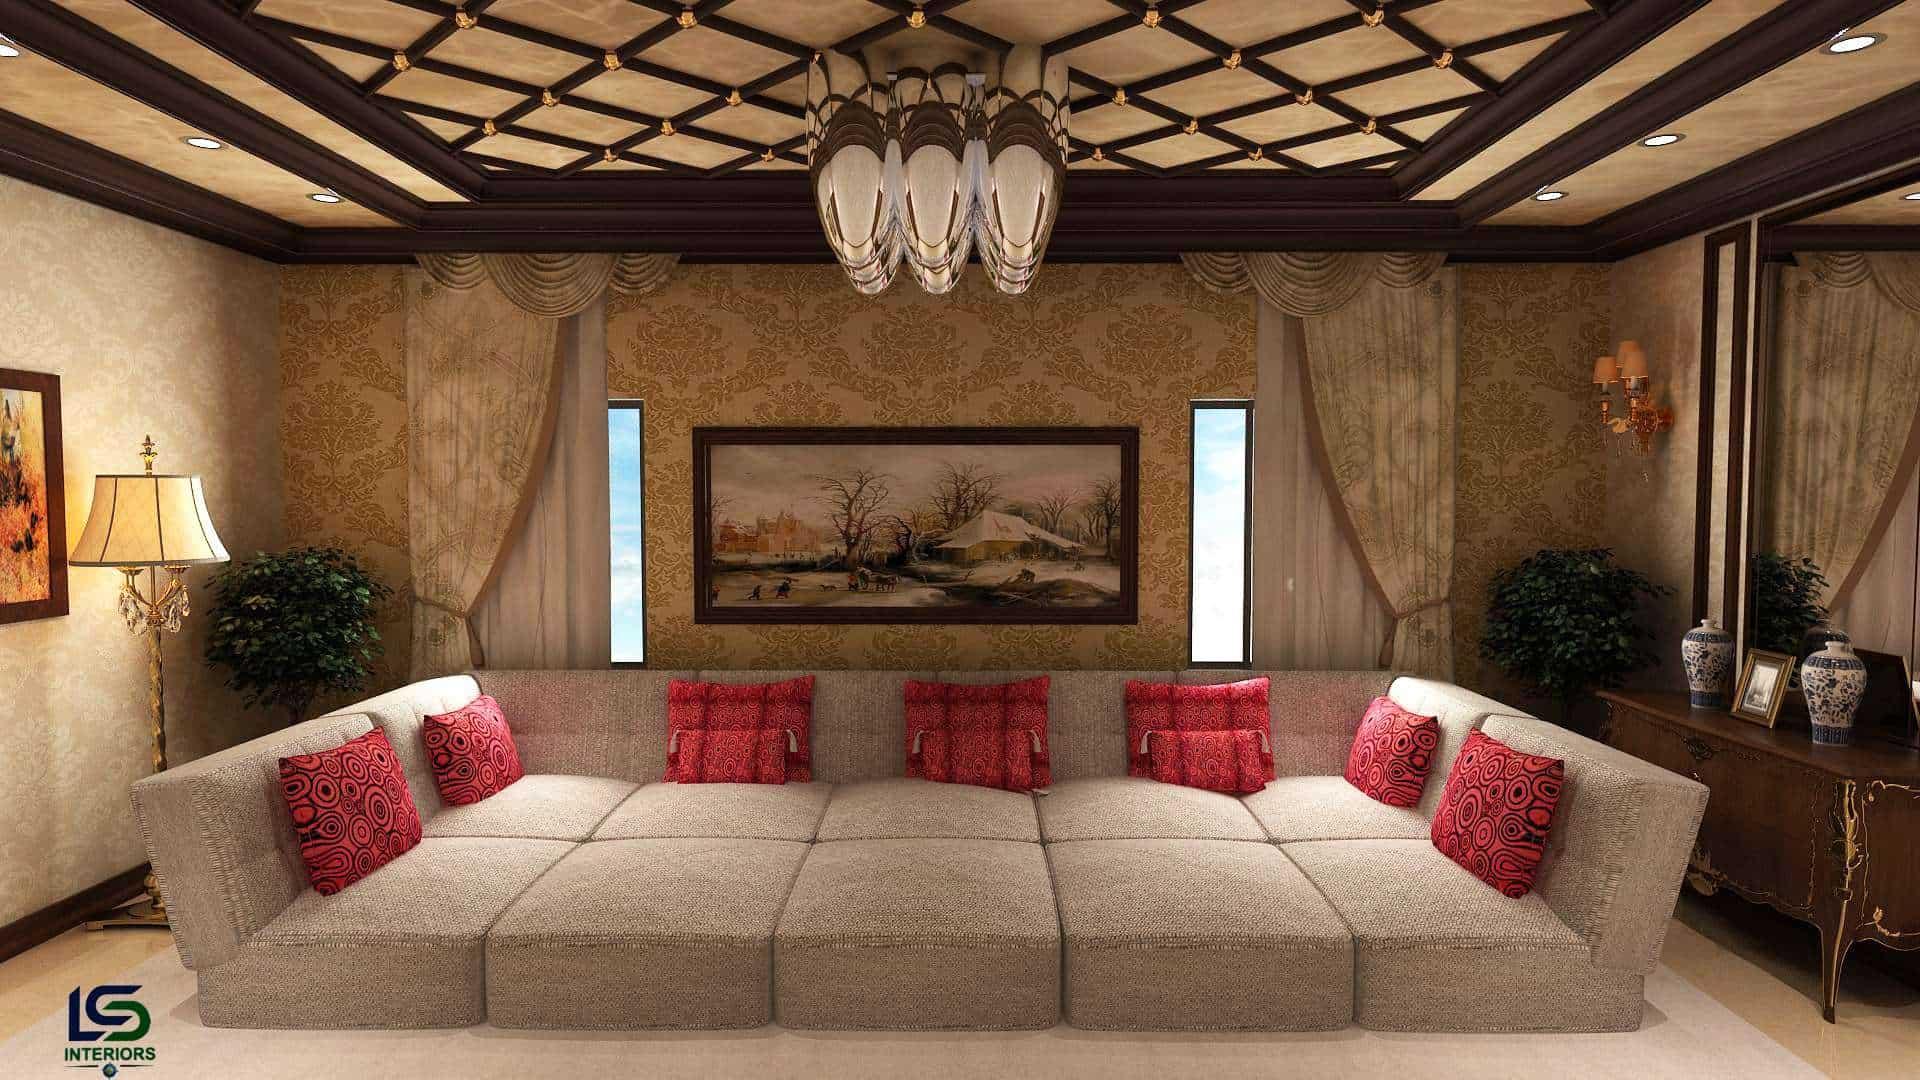 Interior S Salt Lake City Home Decor 2018